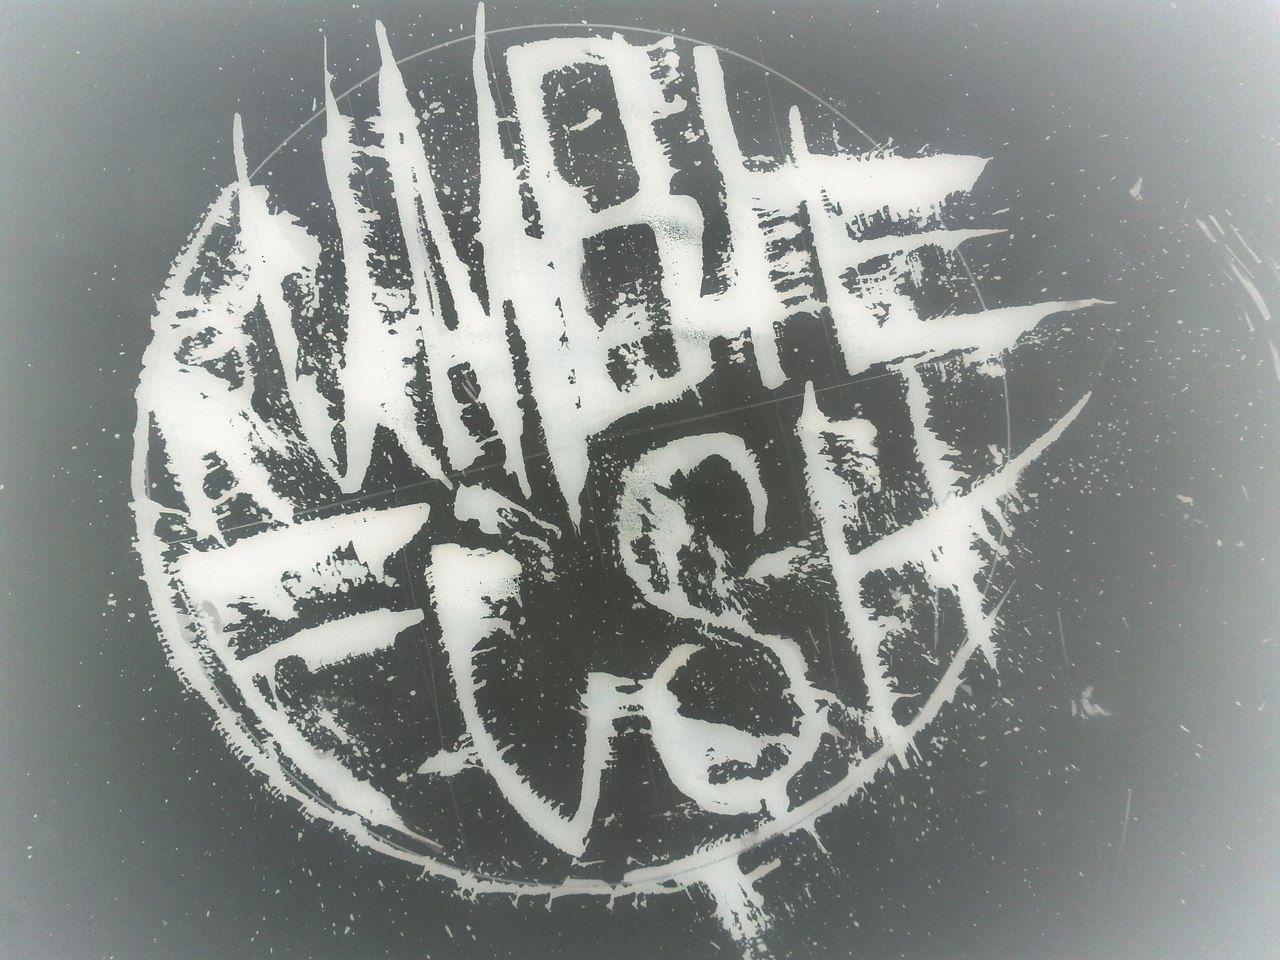 #lettering #colapen #ink #handwriting #rumblefish #nick_visan